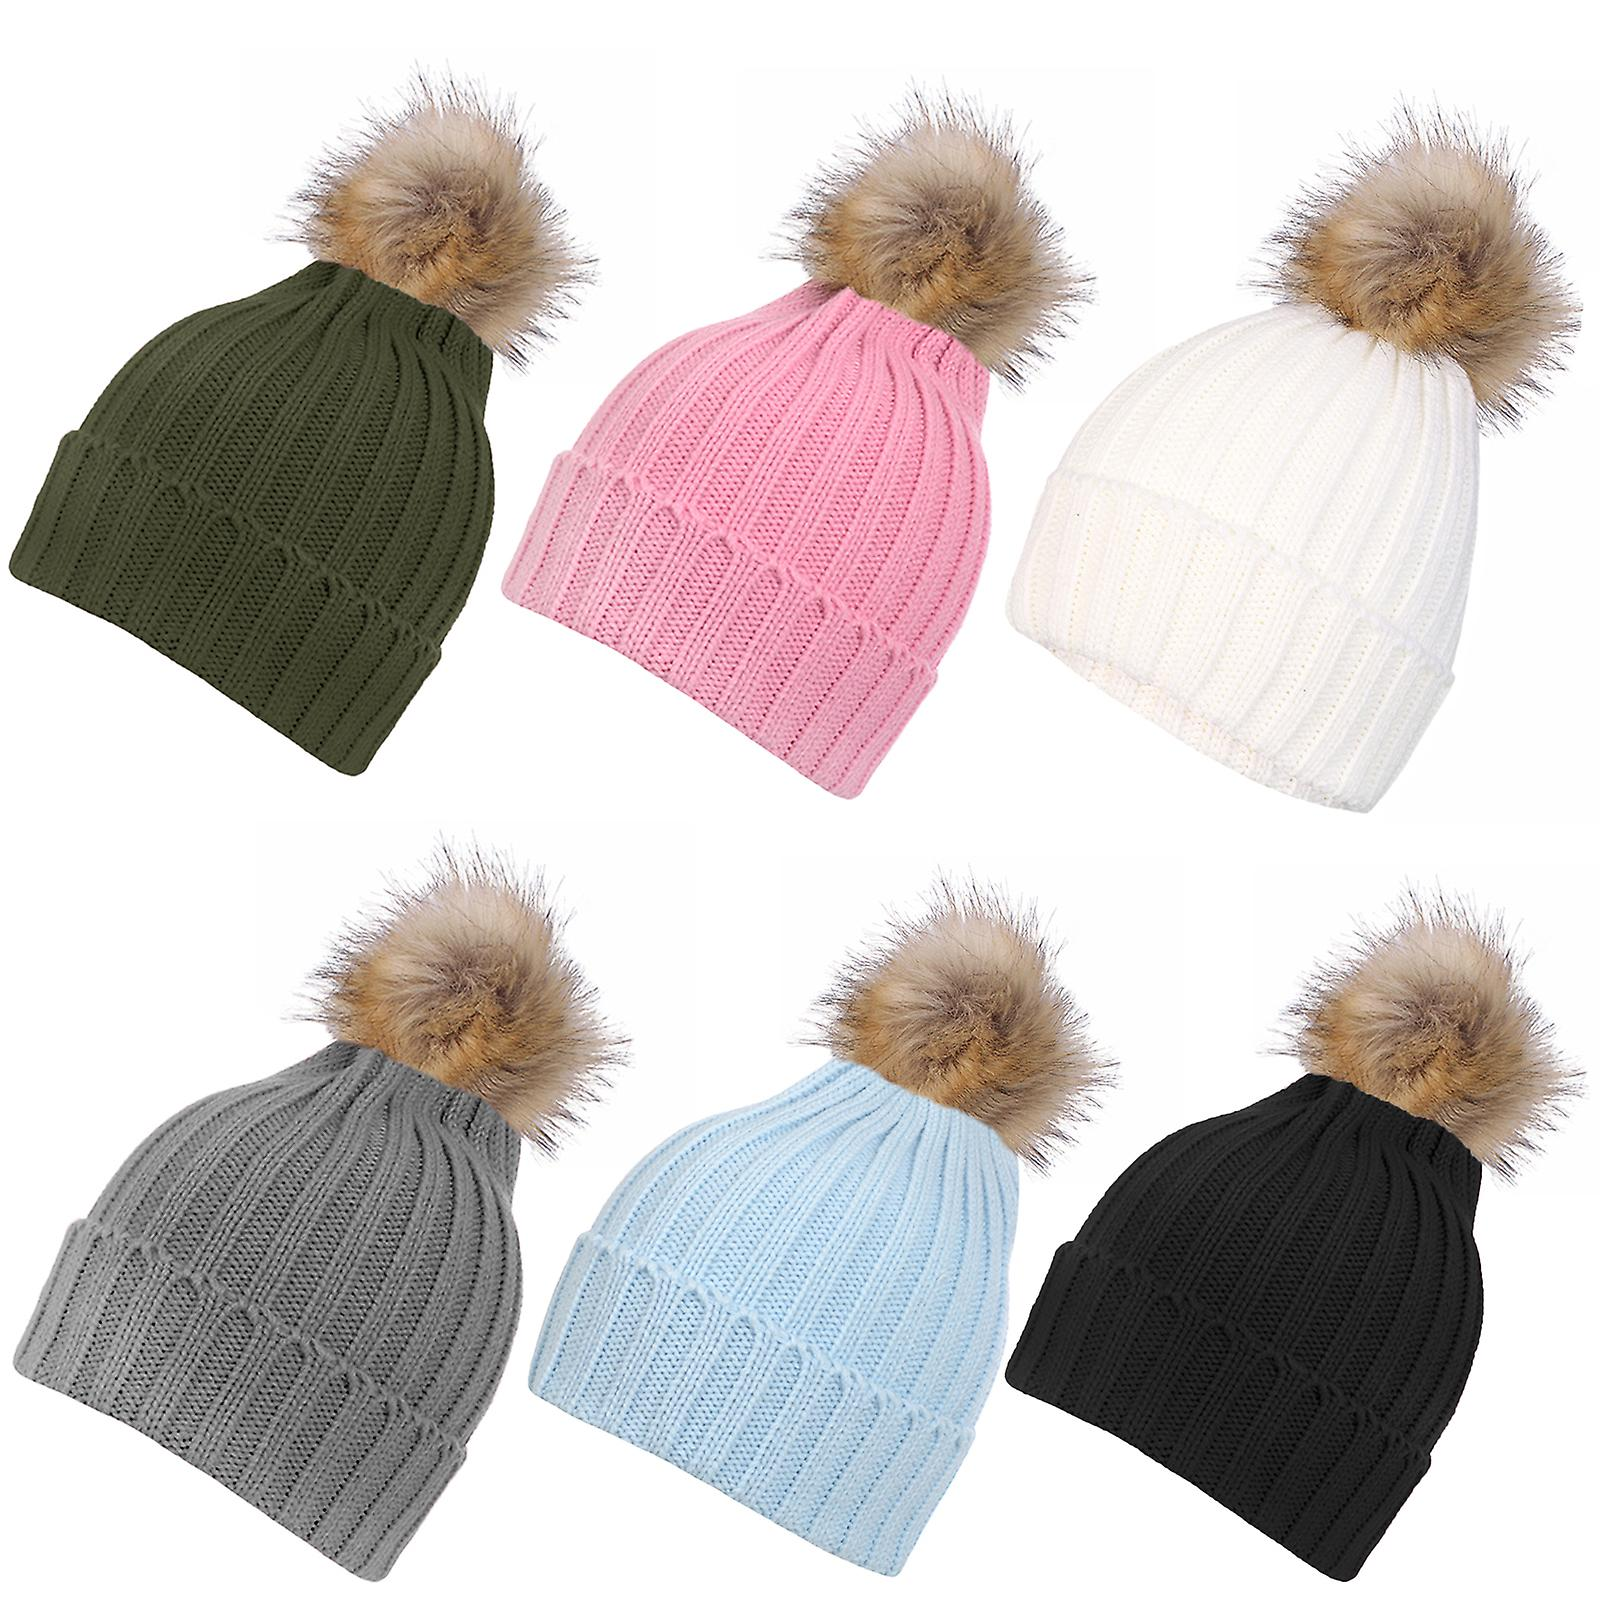 Inspirations Womens Fluffy Faux Fur Pom Pom Beanie Hat Knitted Bobble Hat c6bd38addf